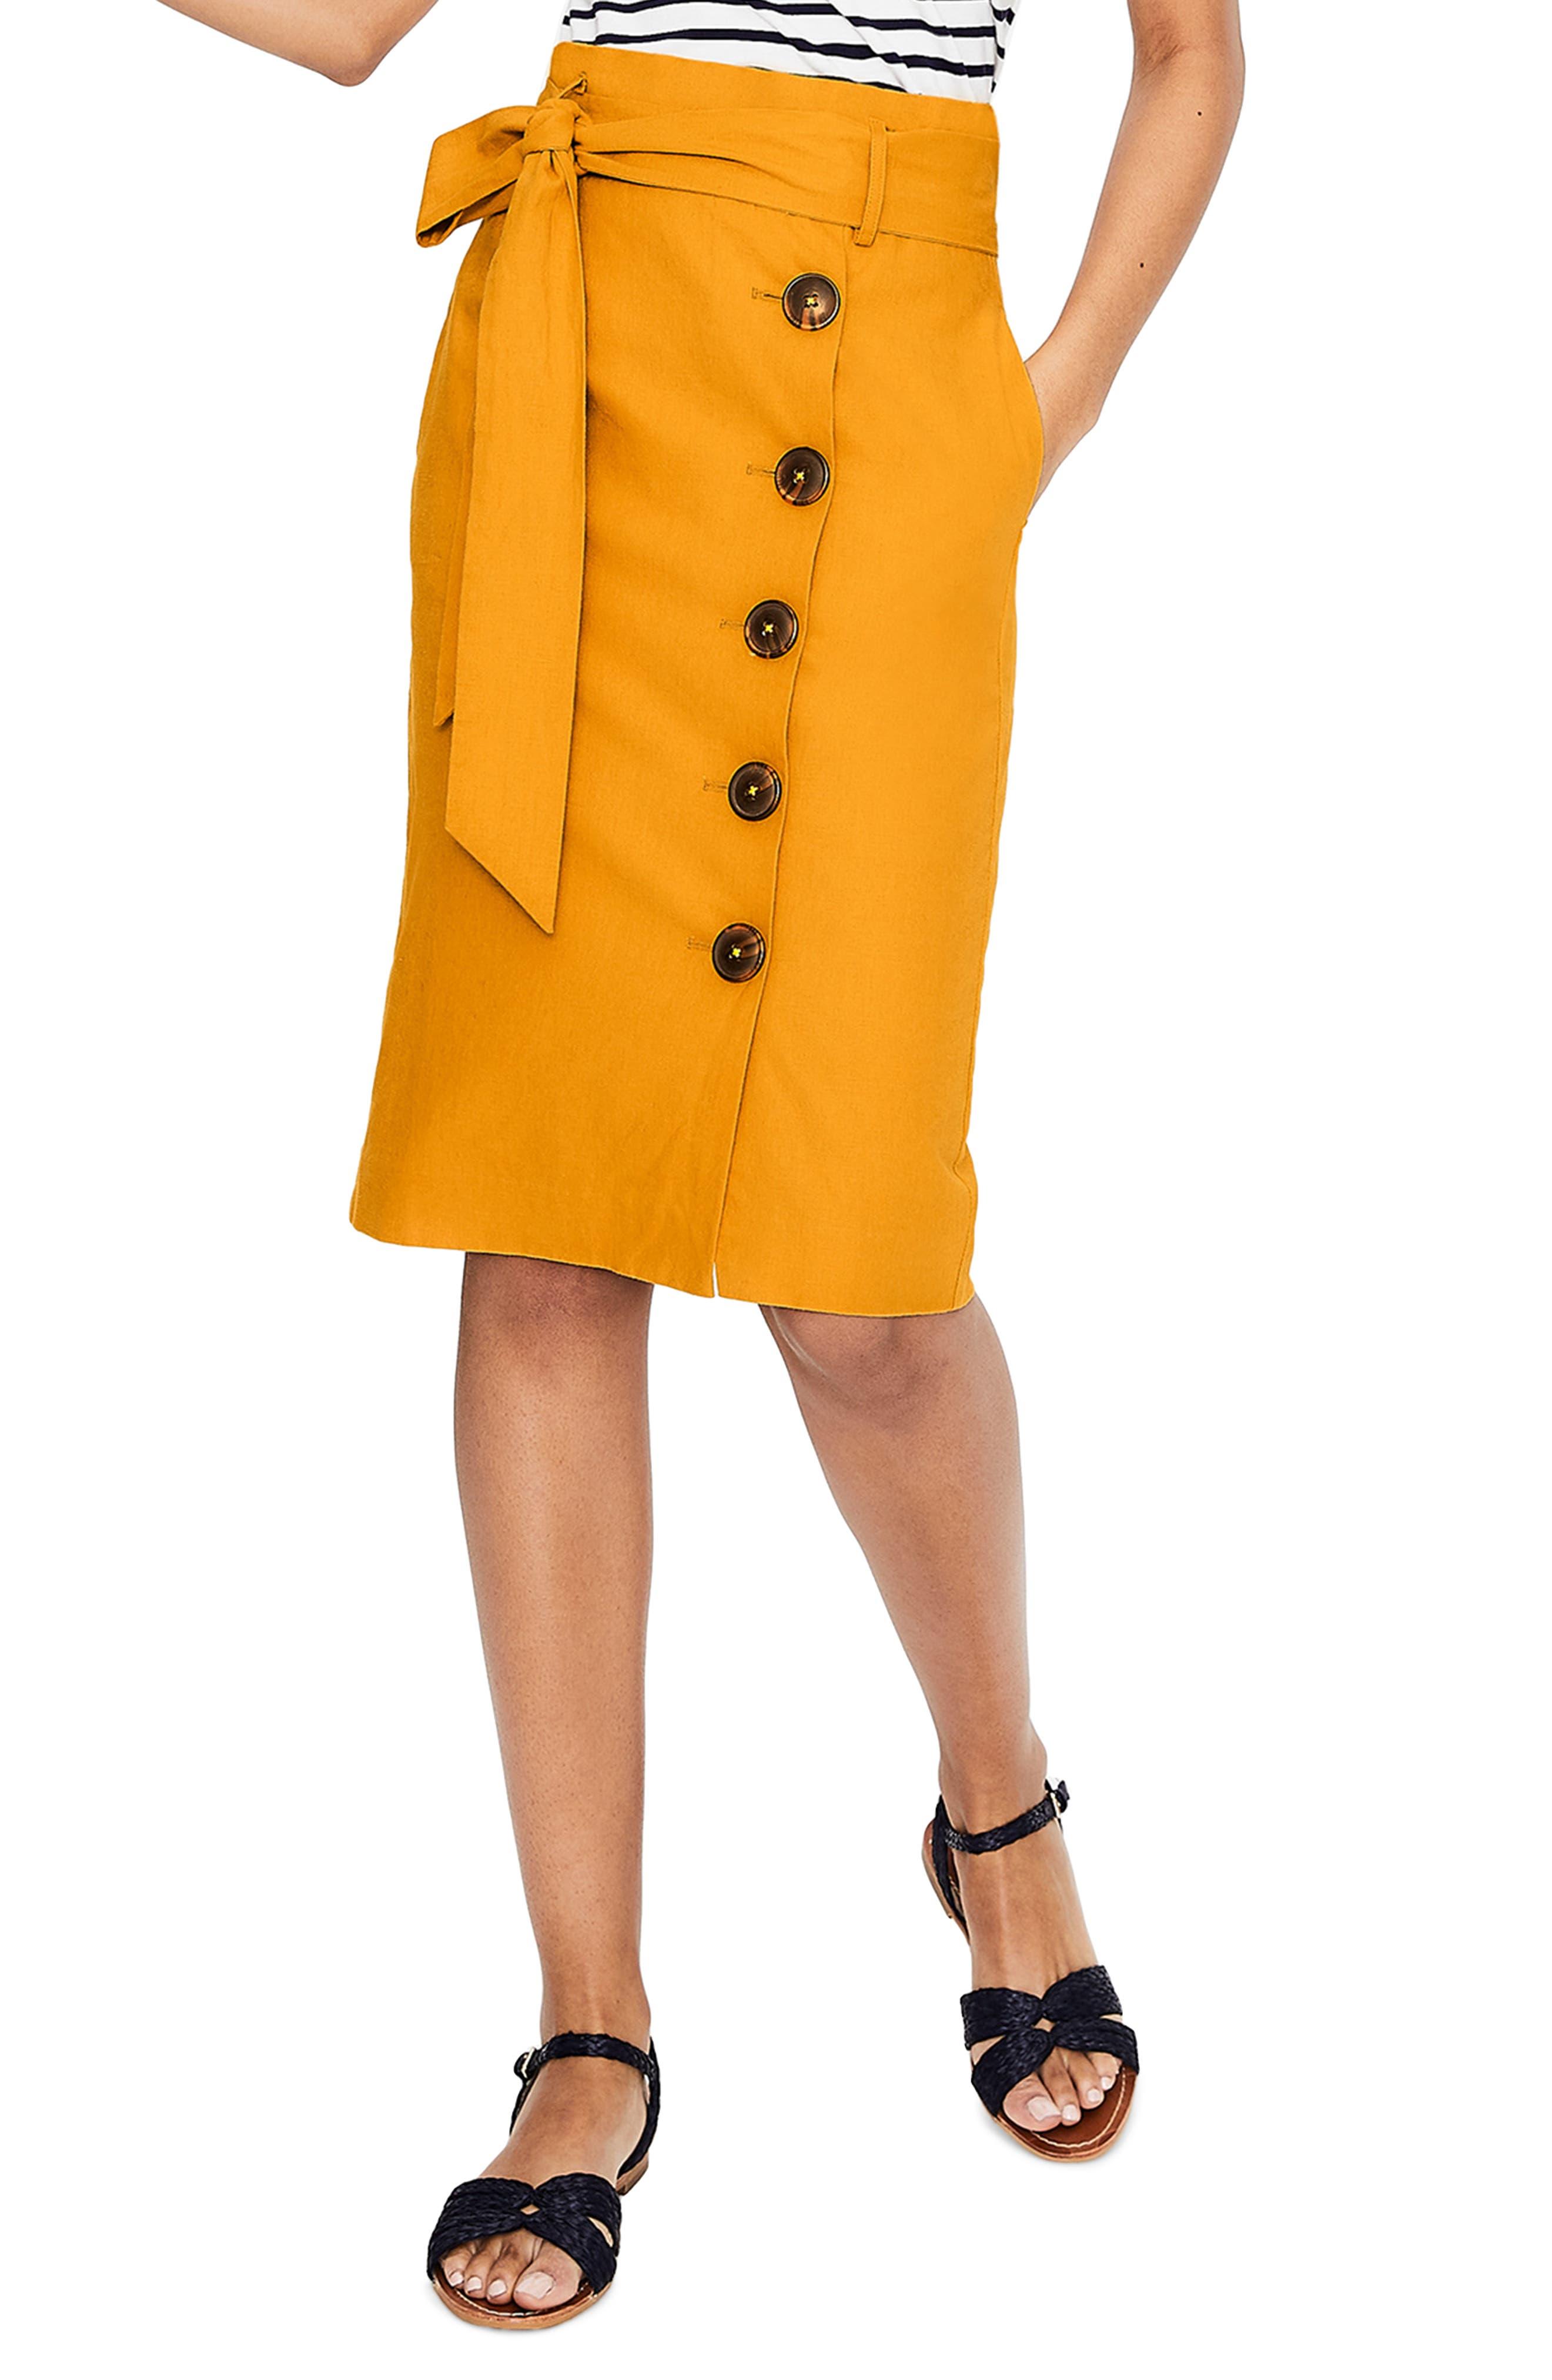 Smart Boden Linen Tan Print Skirt Pockets 10 Skirts Clothing, Shoes & Accessories